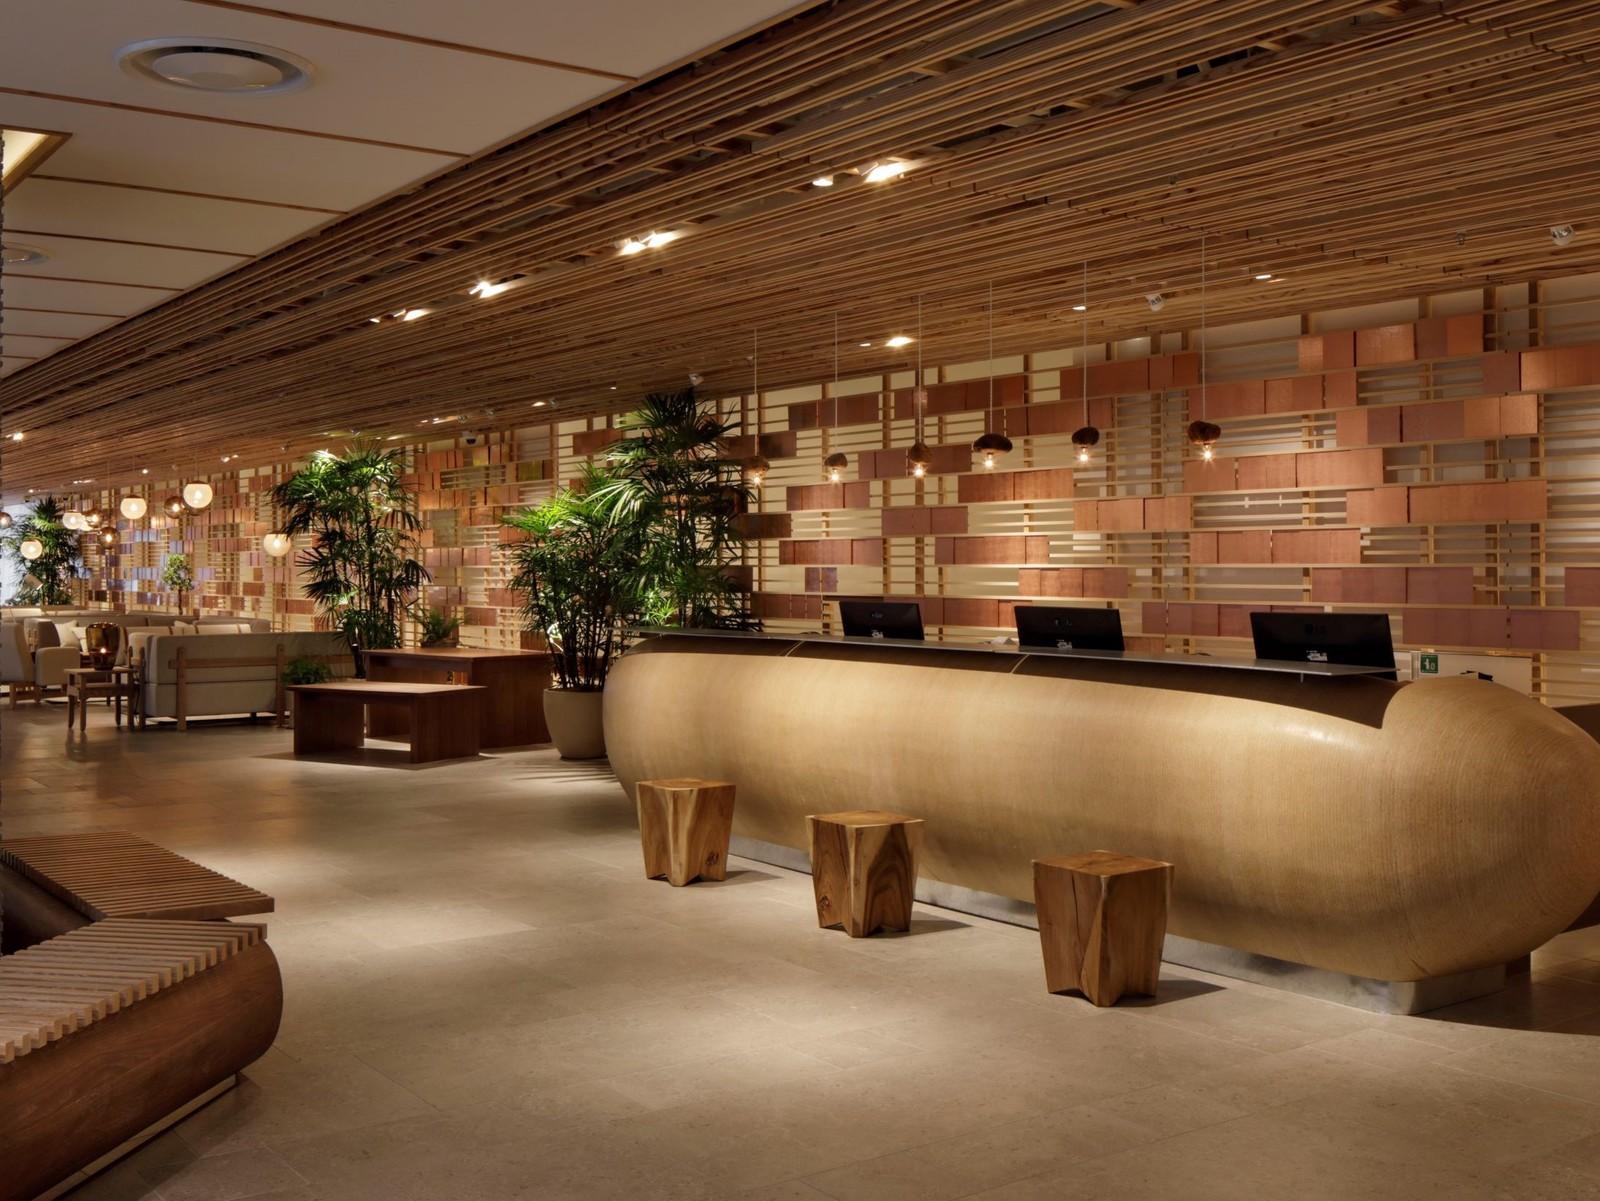 GOOD NATURE HOTEL KYOTO / 【航空券とホテルを一気に予約♪】京都・河原町駅すぐの好立地!観光・お買い物にぴったり!好立地<お食事なし>